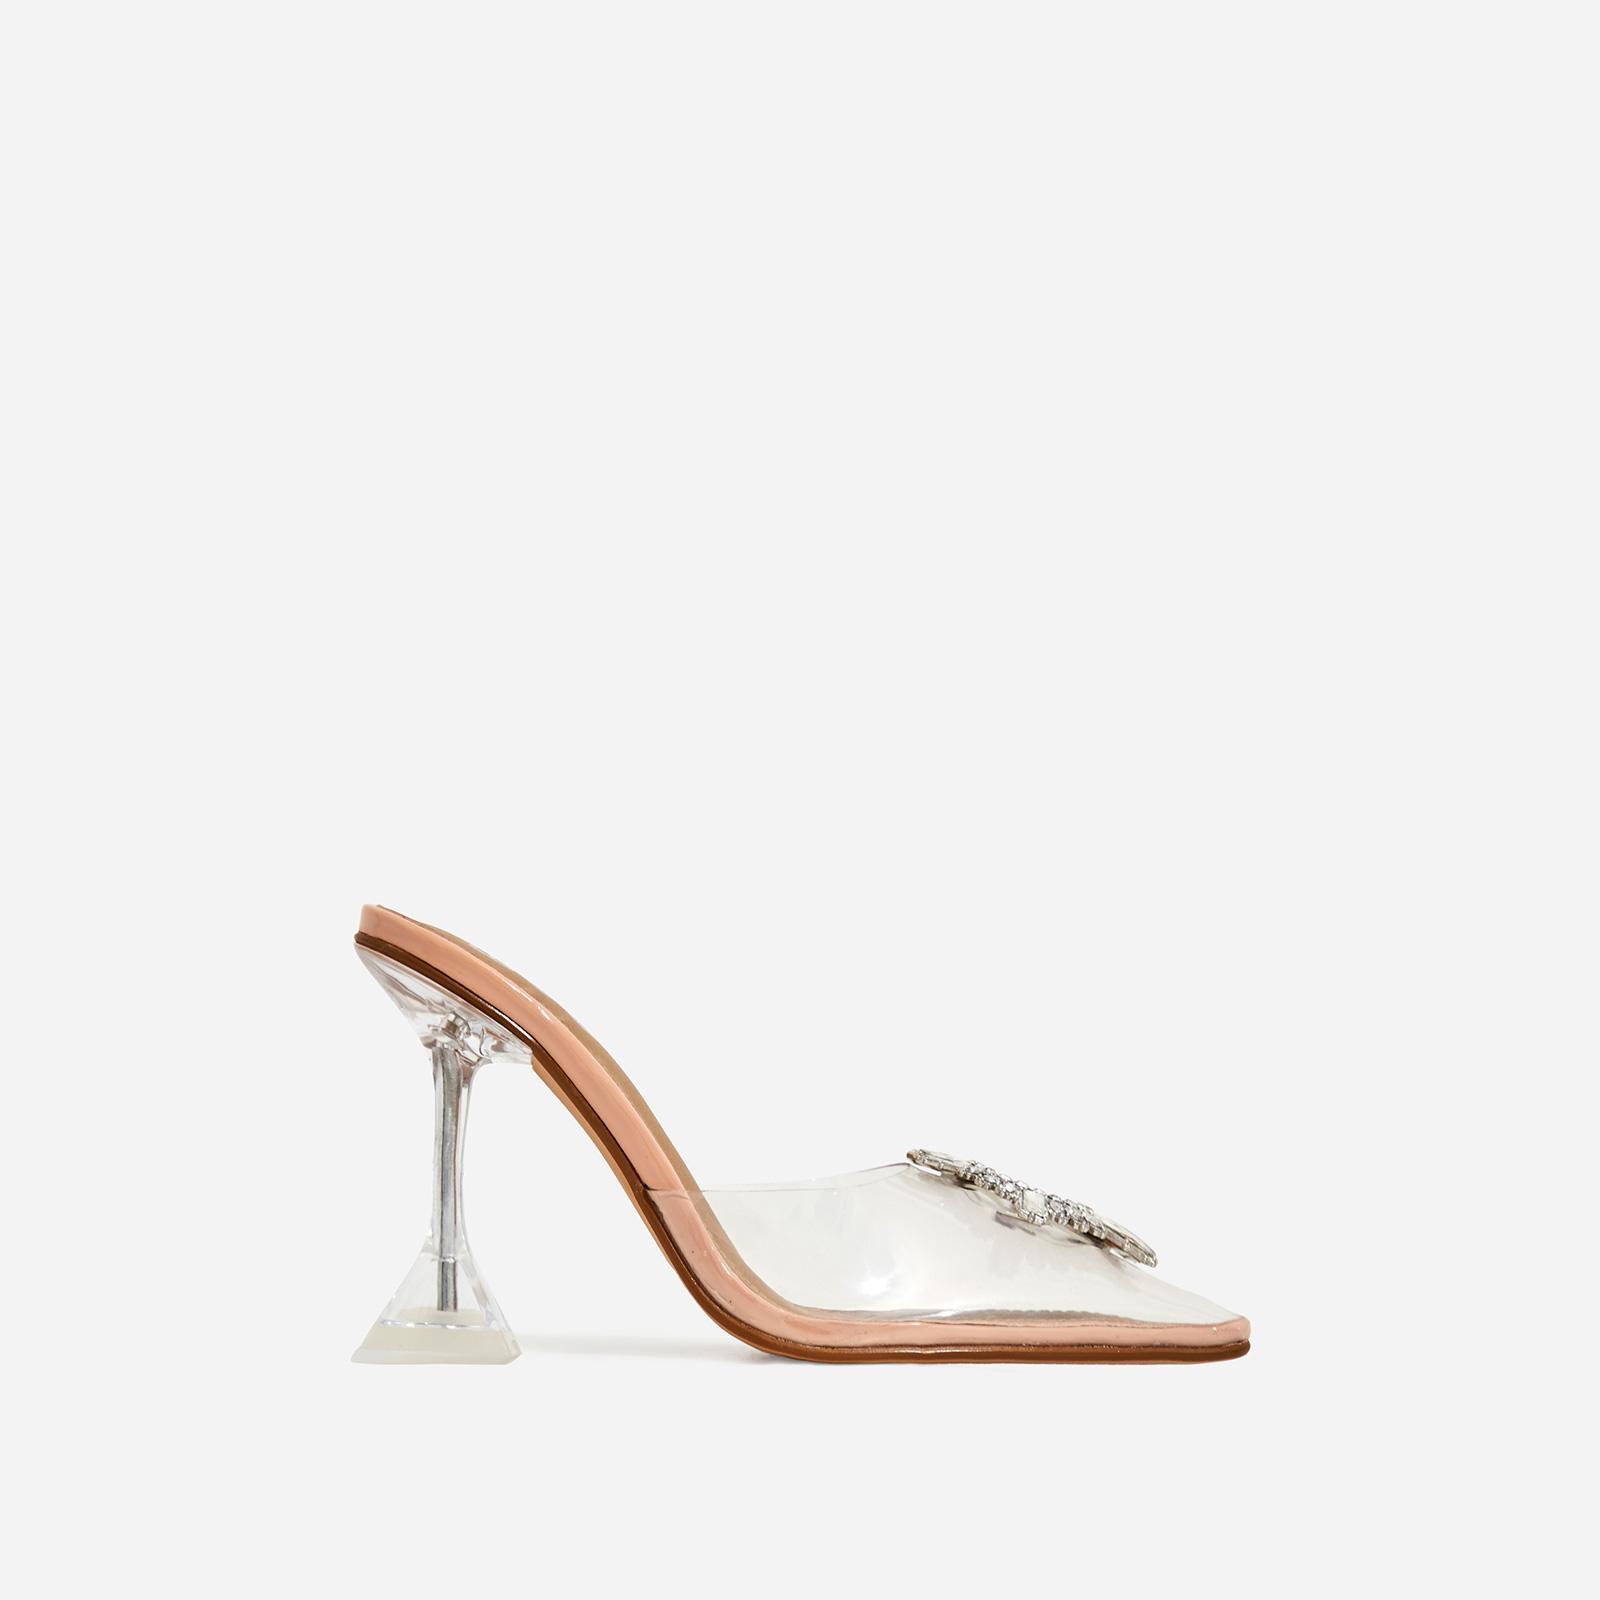 Midnight Diamante Detail Perspex Heel Mule In Nude Patent